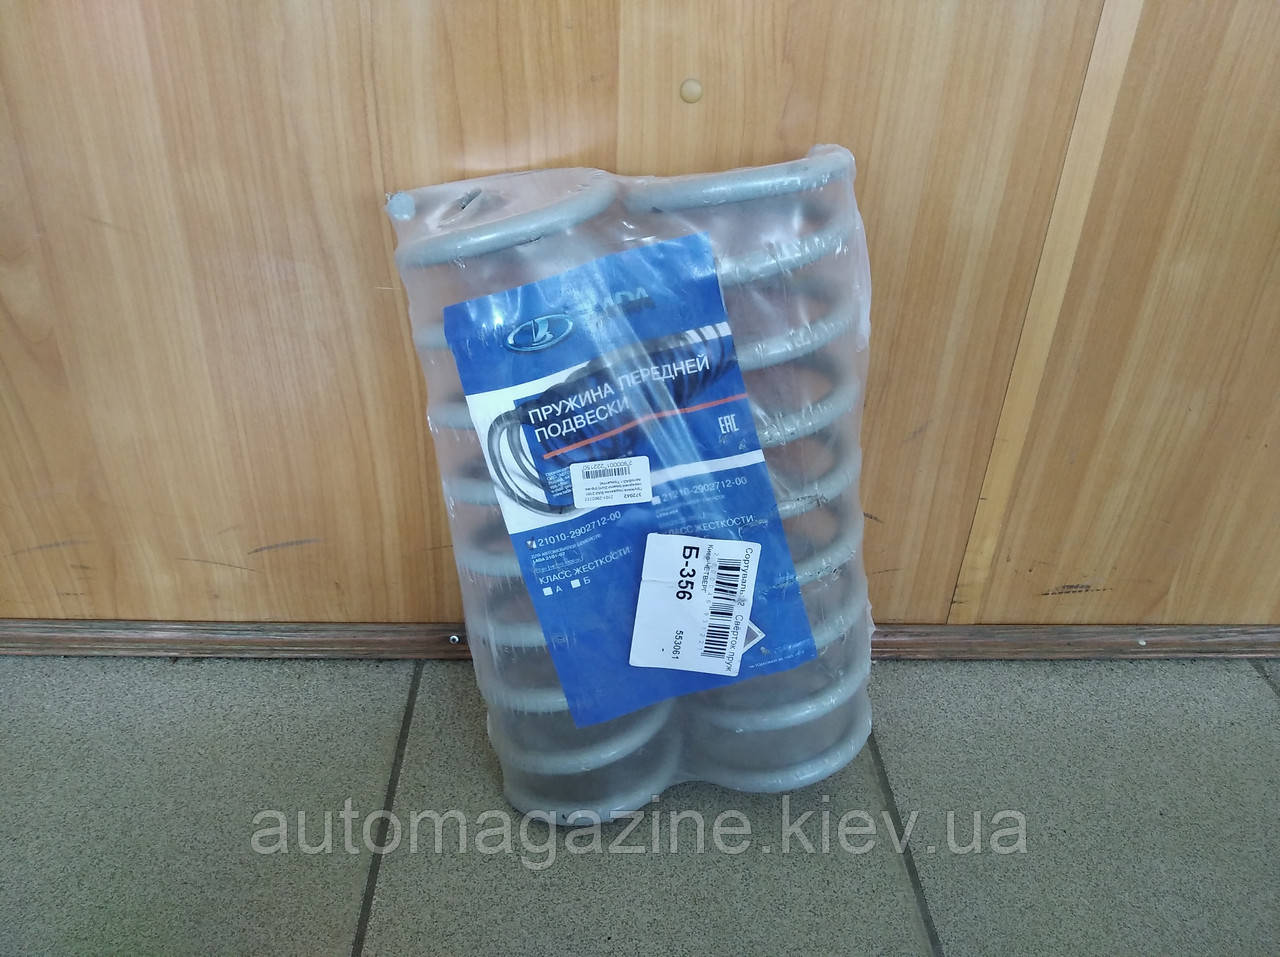 Пружины передние ВАЗ 2101 - 2107 (АвтоВАЗ)